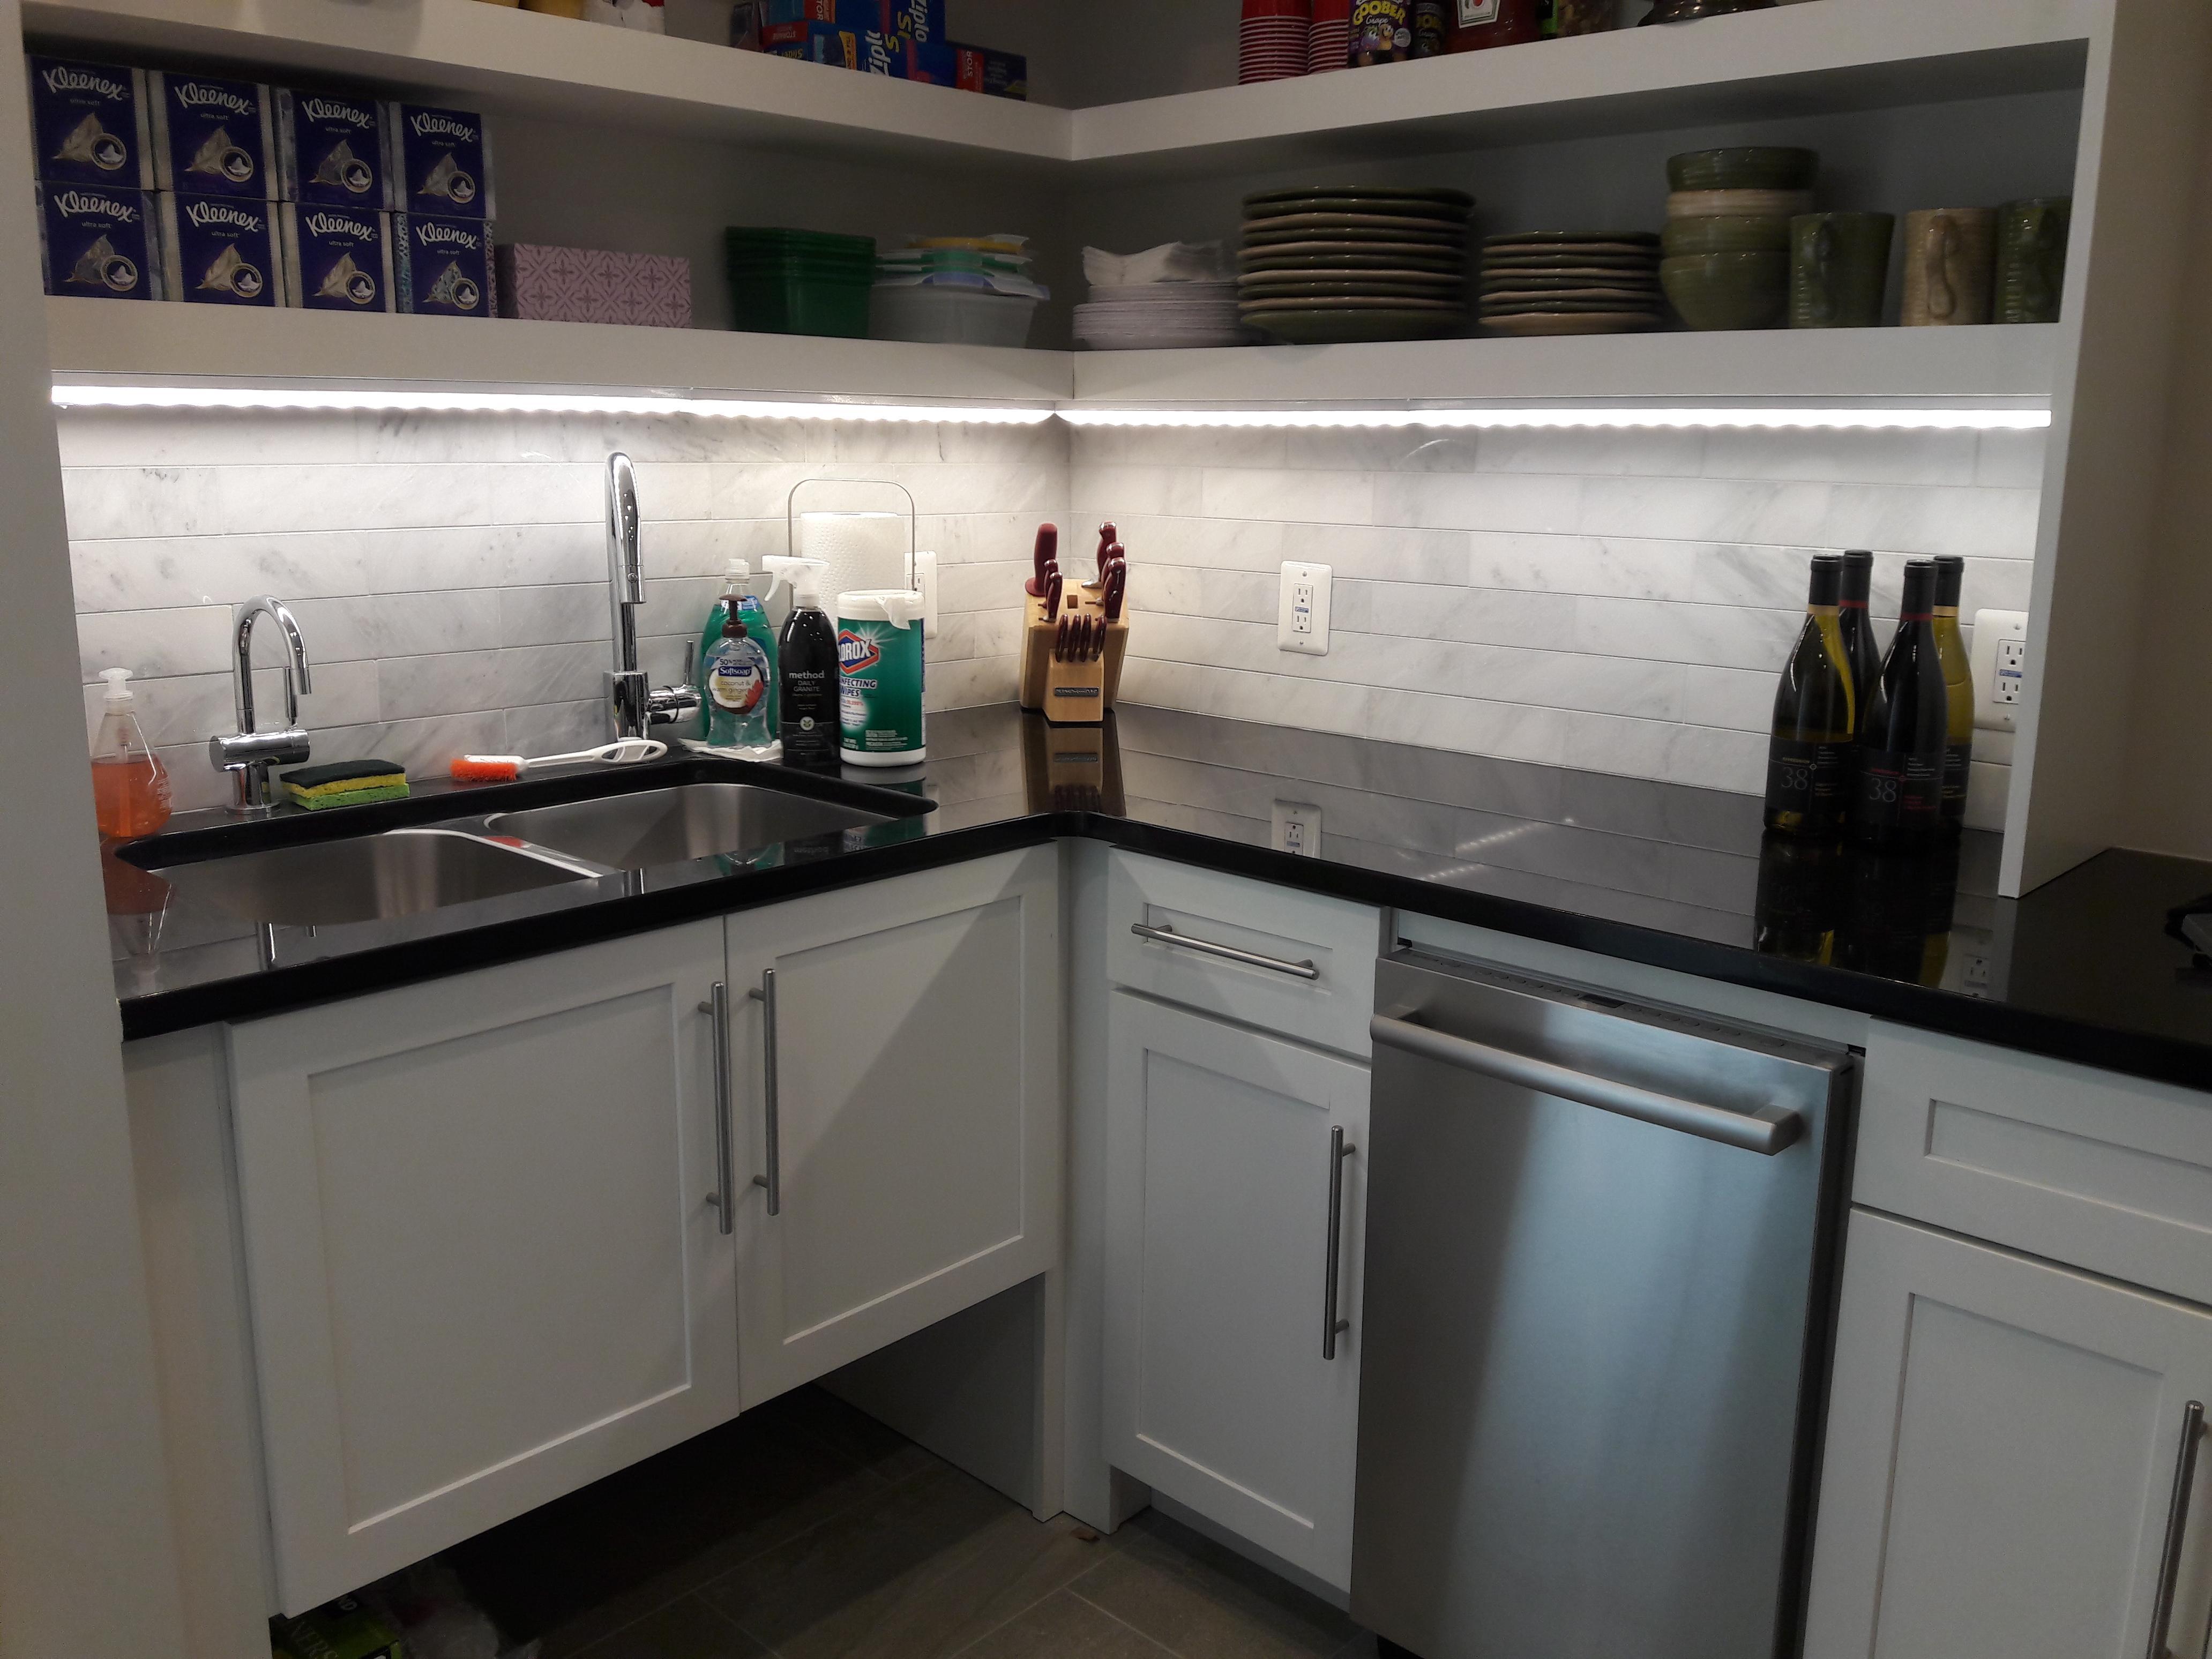 Basement kitchen counter after